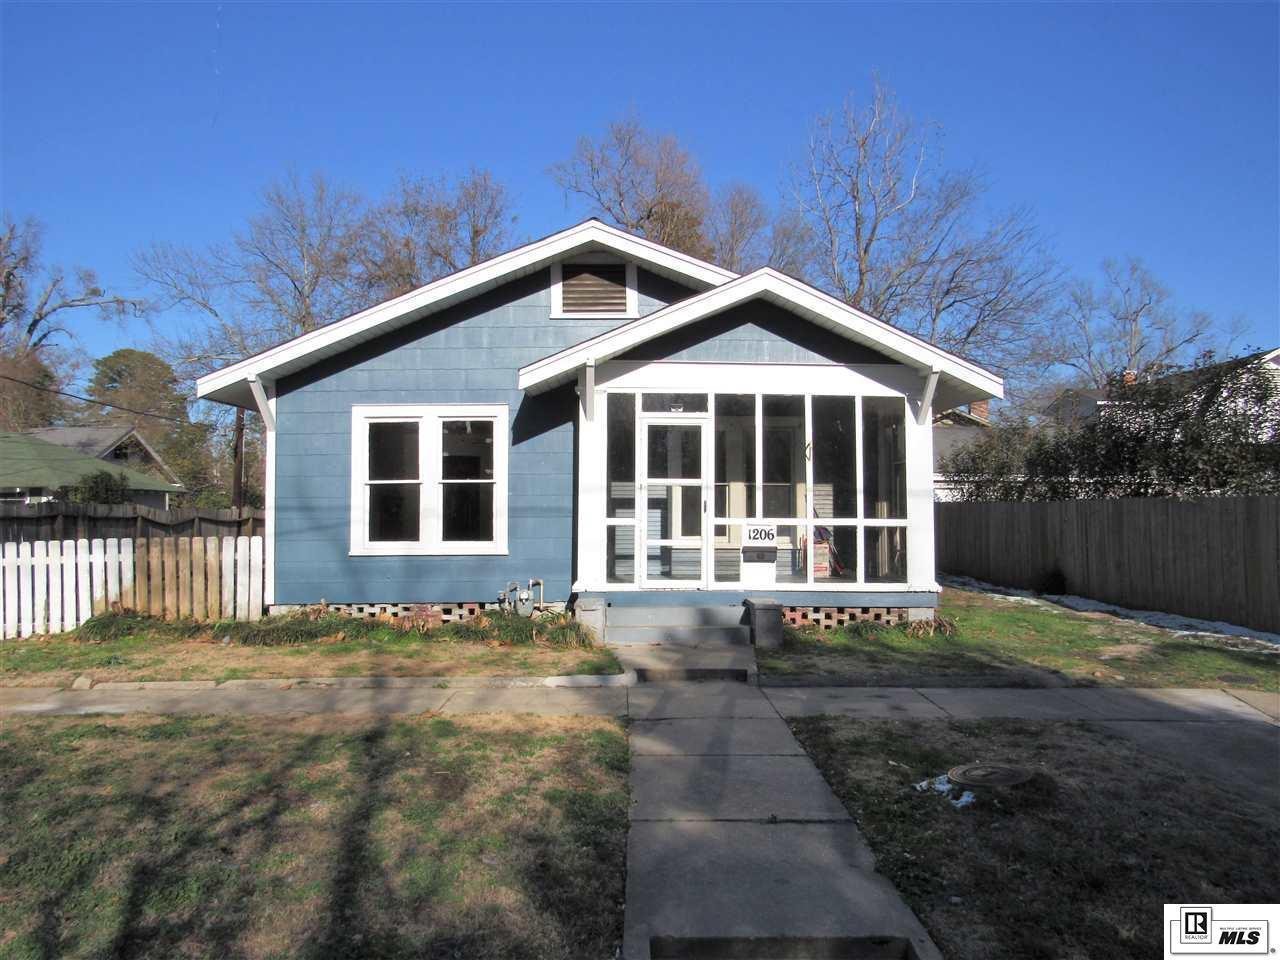 1206 N 1st St Monroe La Mls 180947 Better Homes And